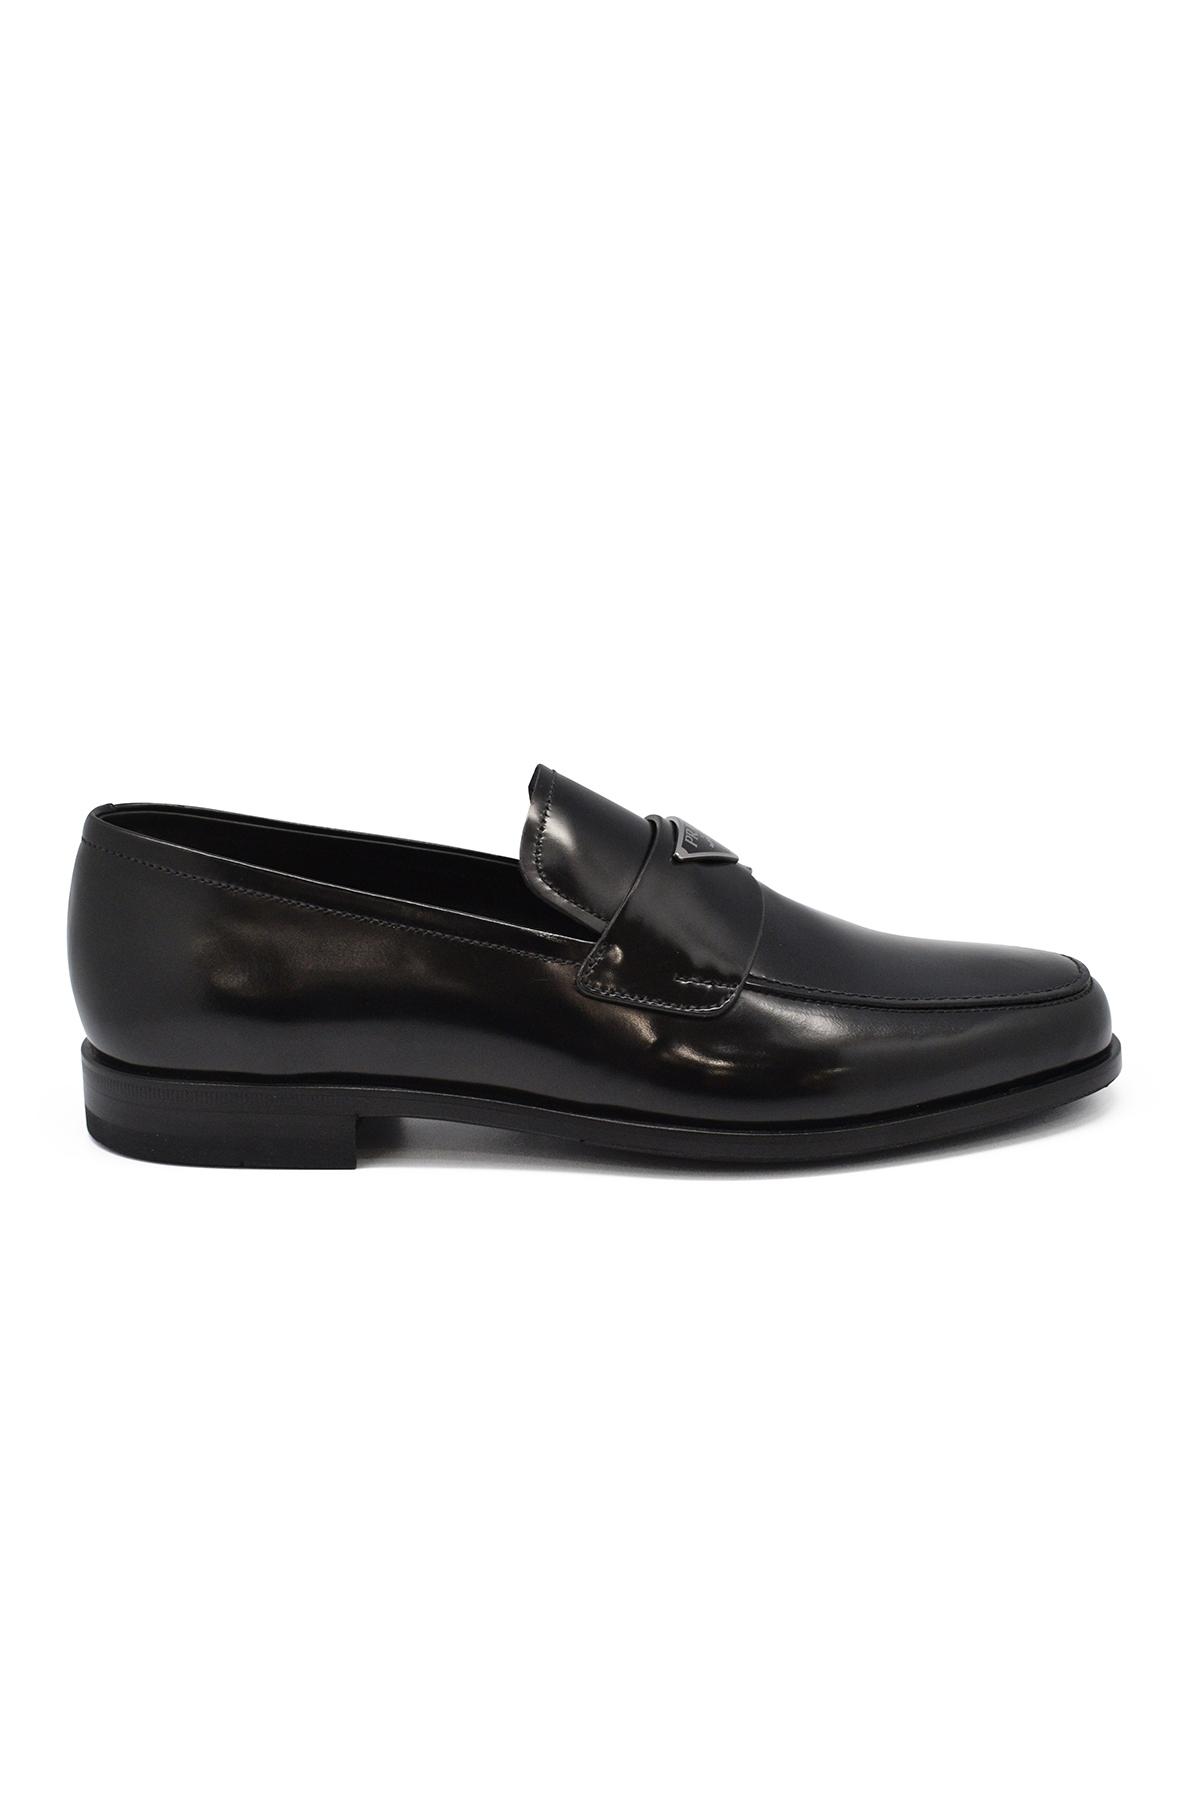 Black leather Prada loafers